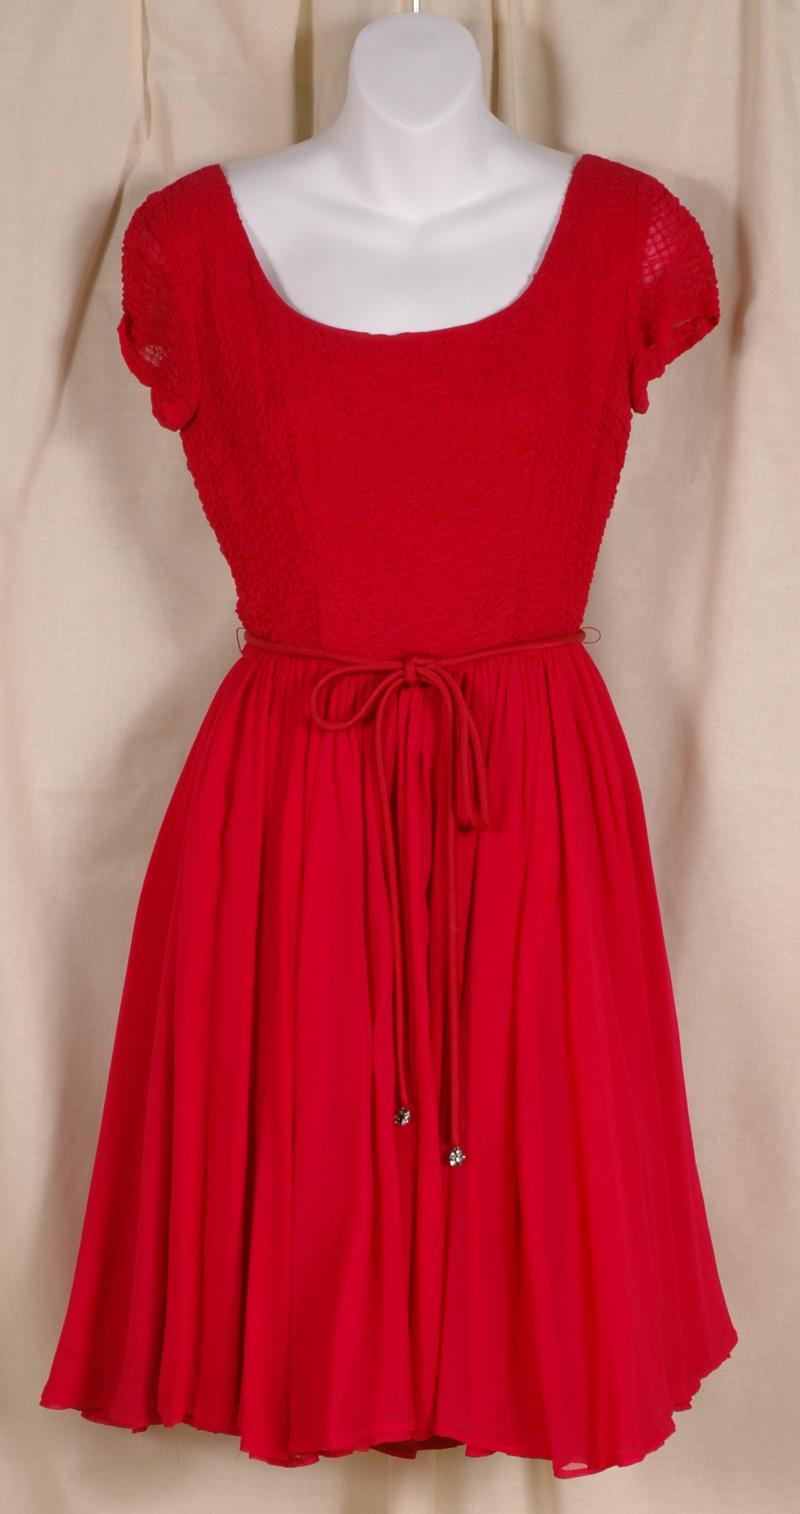 red dress 2 - آداب میزبانی و میهمانی در ضیافت شب یلدا بلندترین شب سال